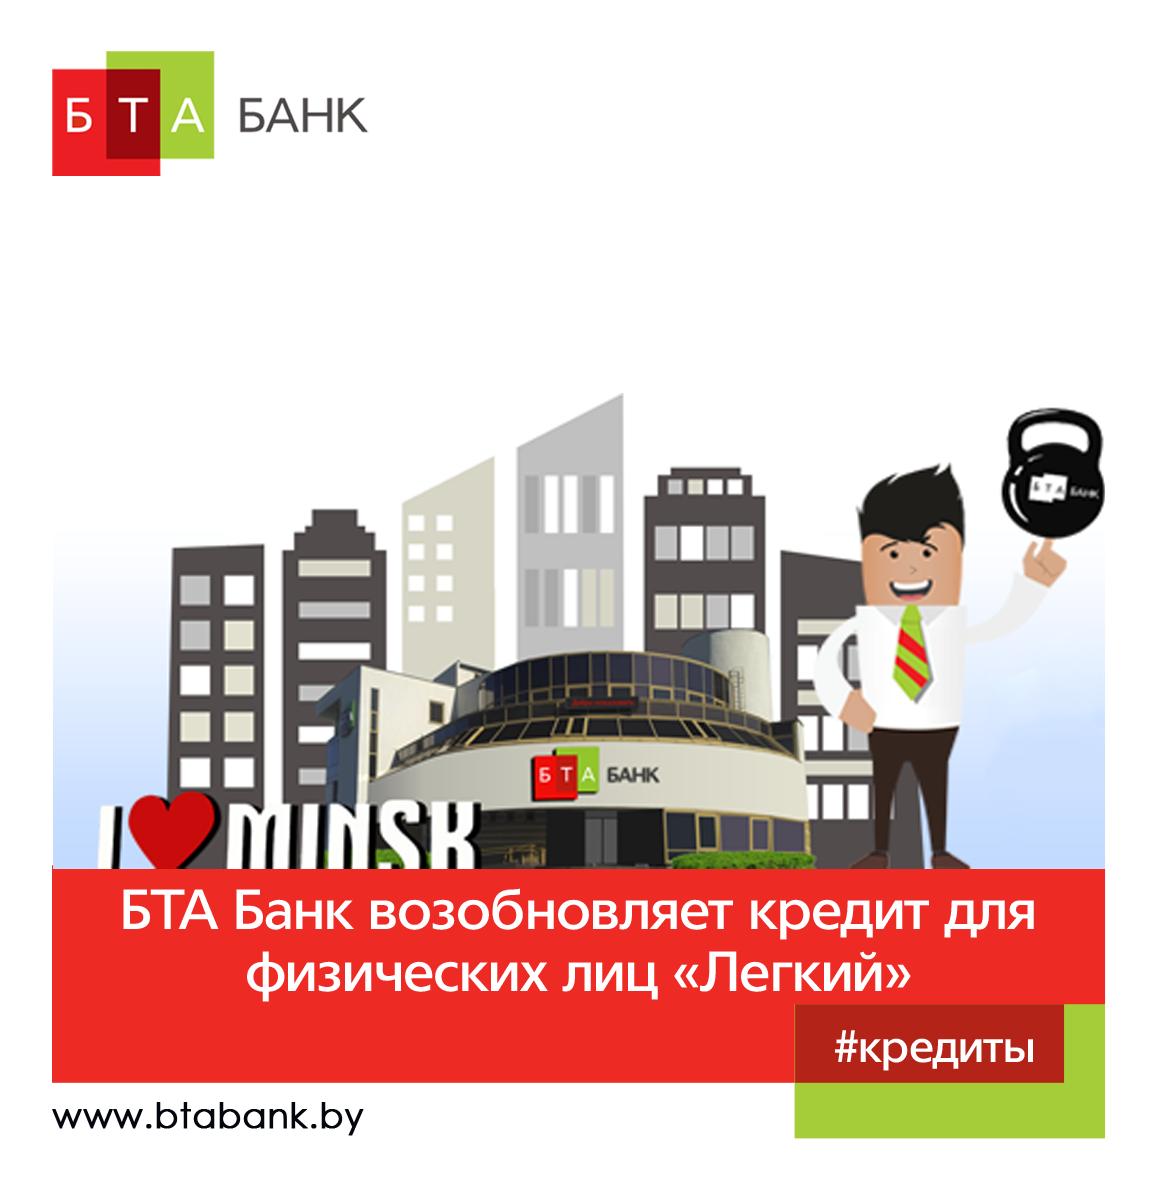 Бта банк онлайн кредит хочу взять кредит по одному паспорту